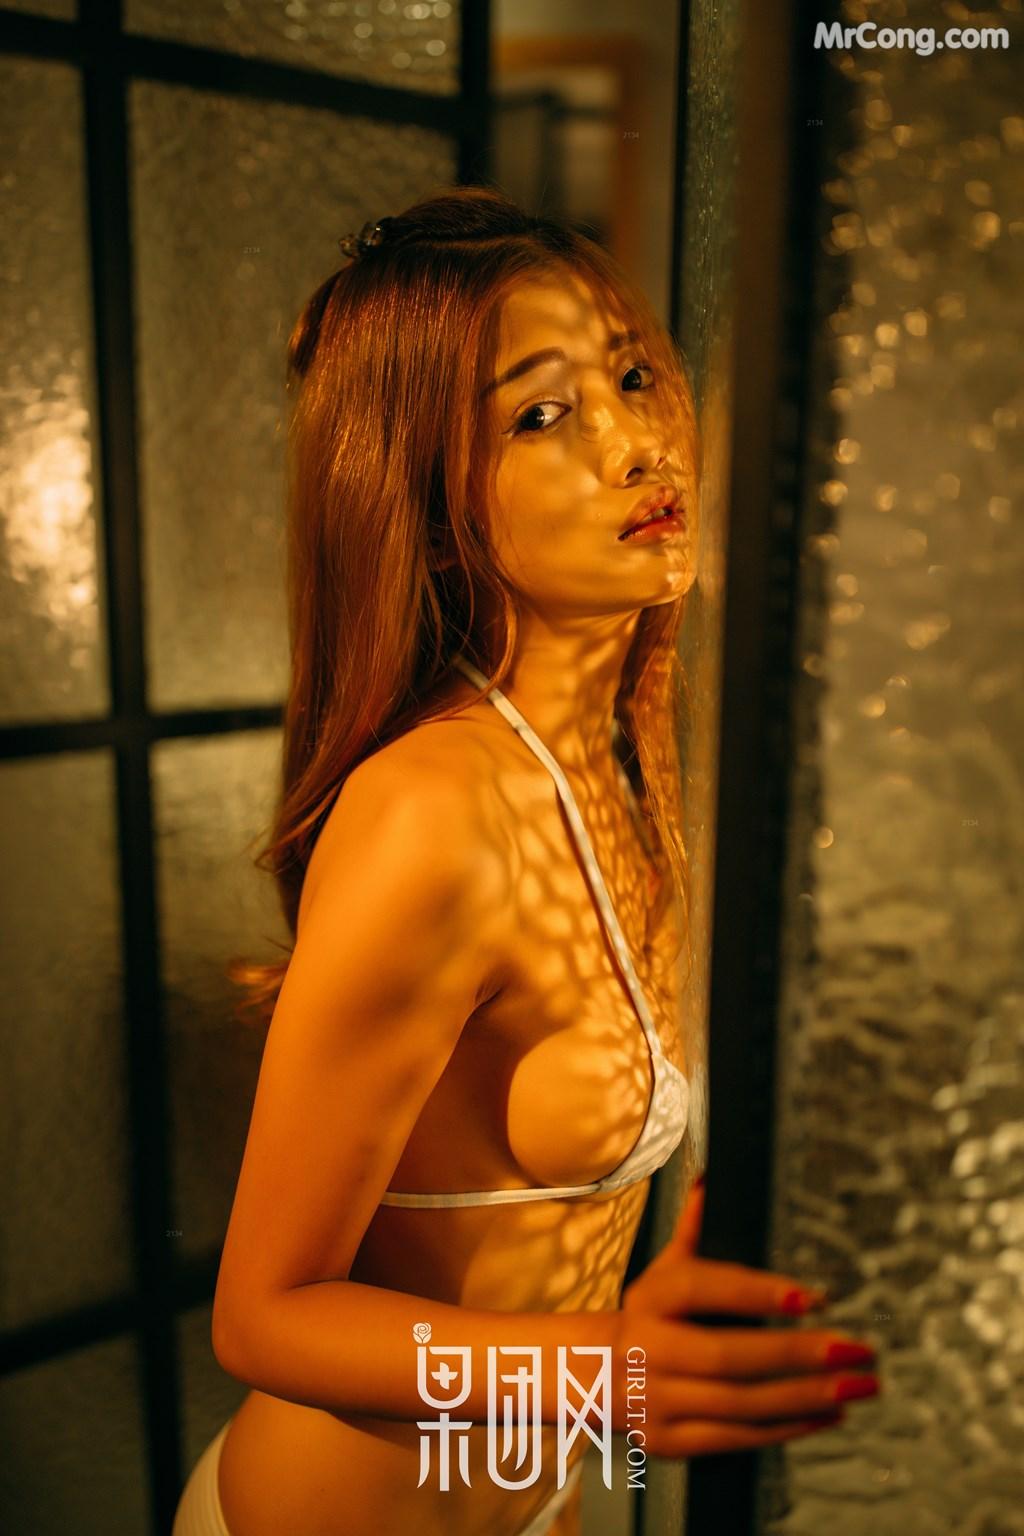 Image GIRLT-XCJX-No.011-MrCong.com-019 in post GIRLT XCJX No.011 (54 ảnh)